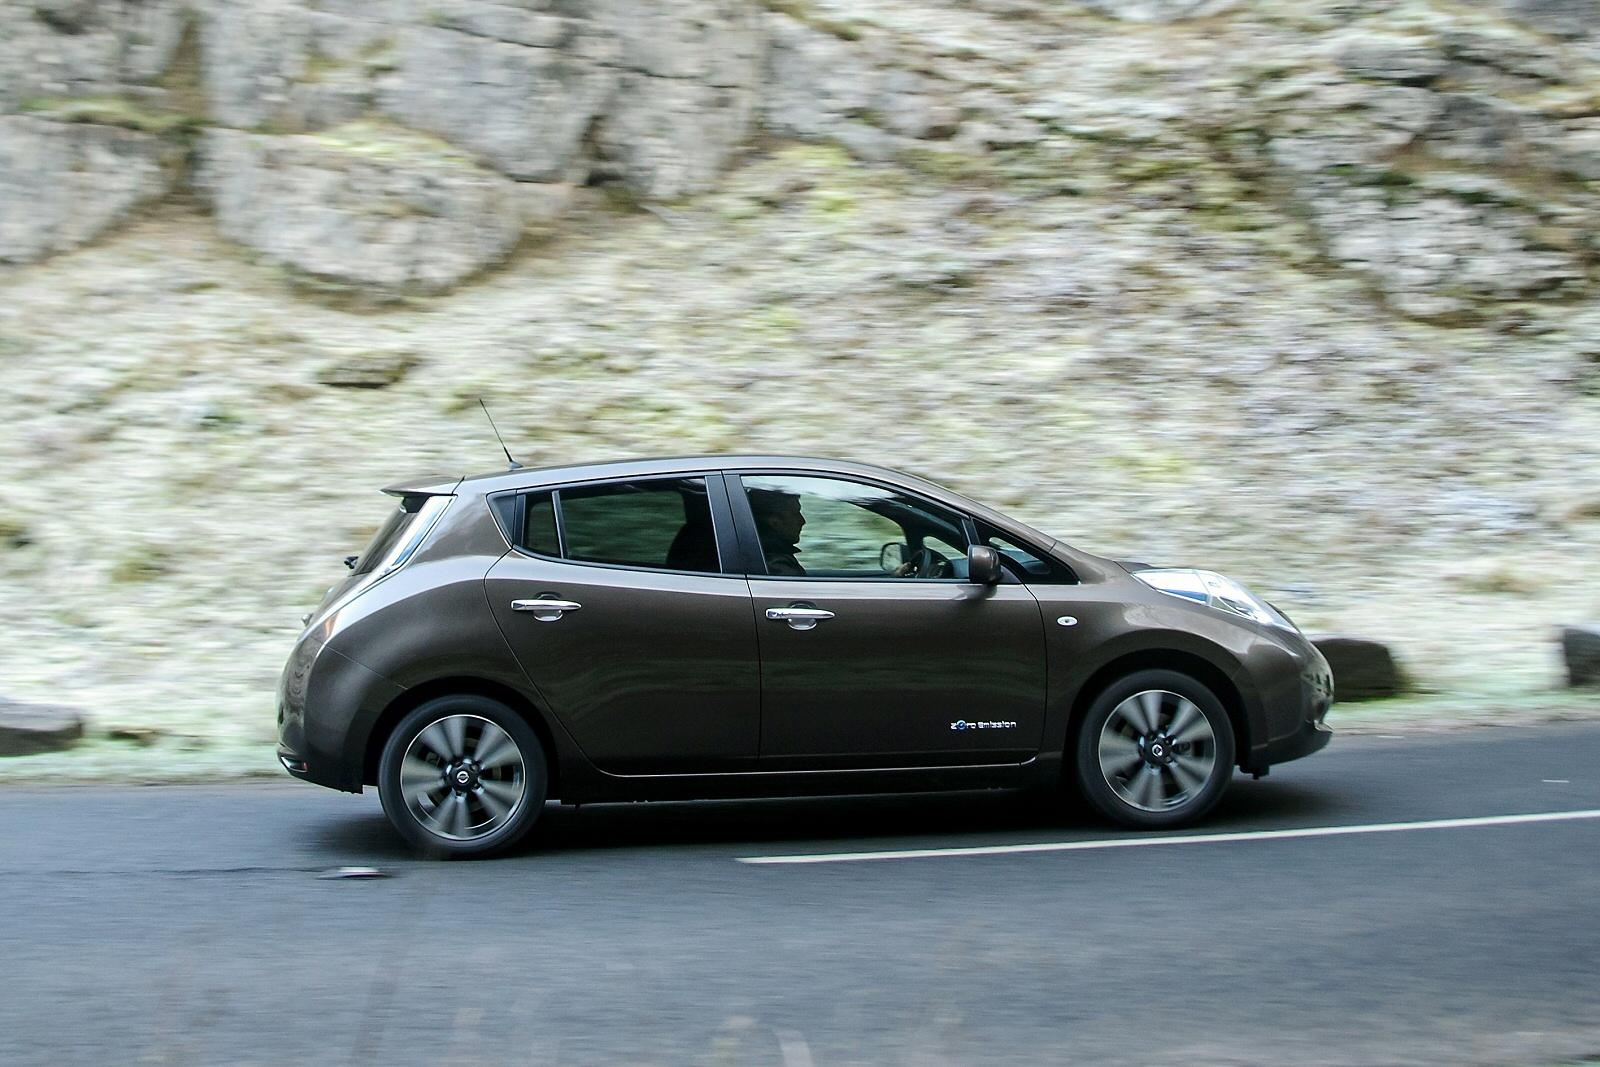 nissan leaf tekna 30kwh 5dr auto 6 6kw charger electric hatchback for sale the taxi centre. Black Bedroom Furniture Sets. Home Design Ideas